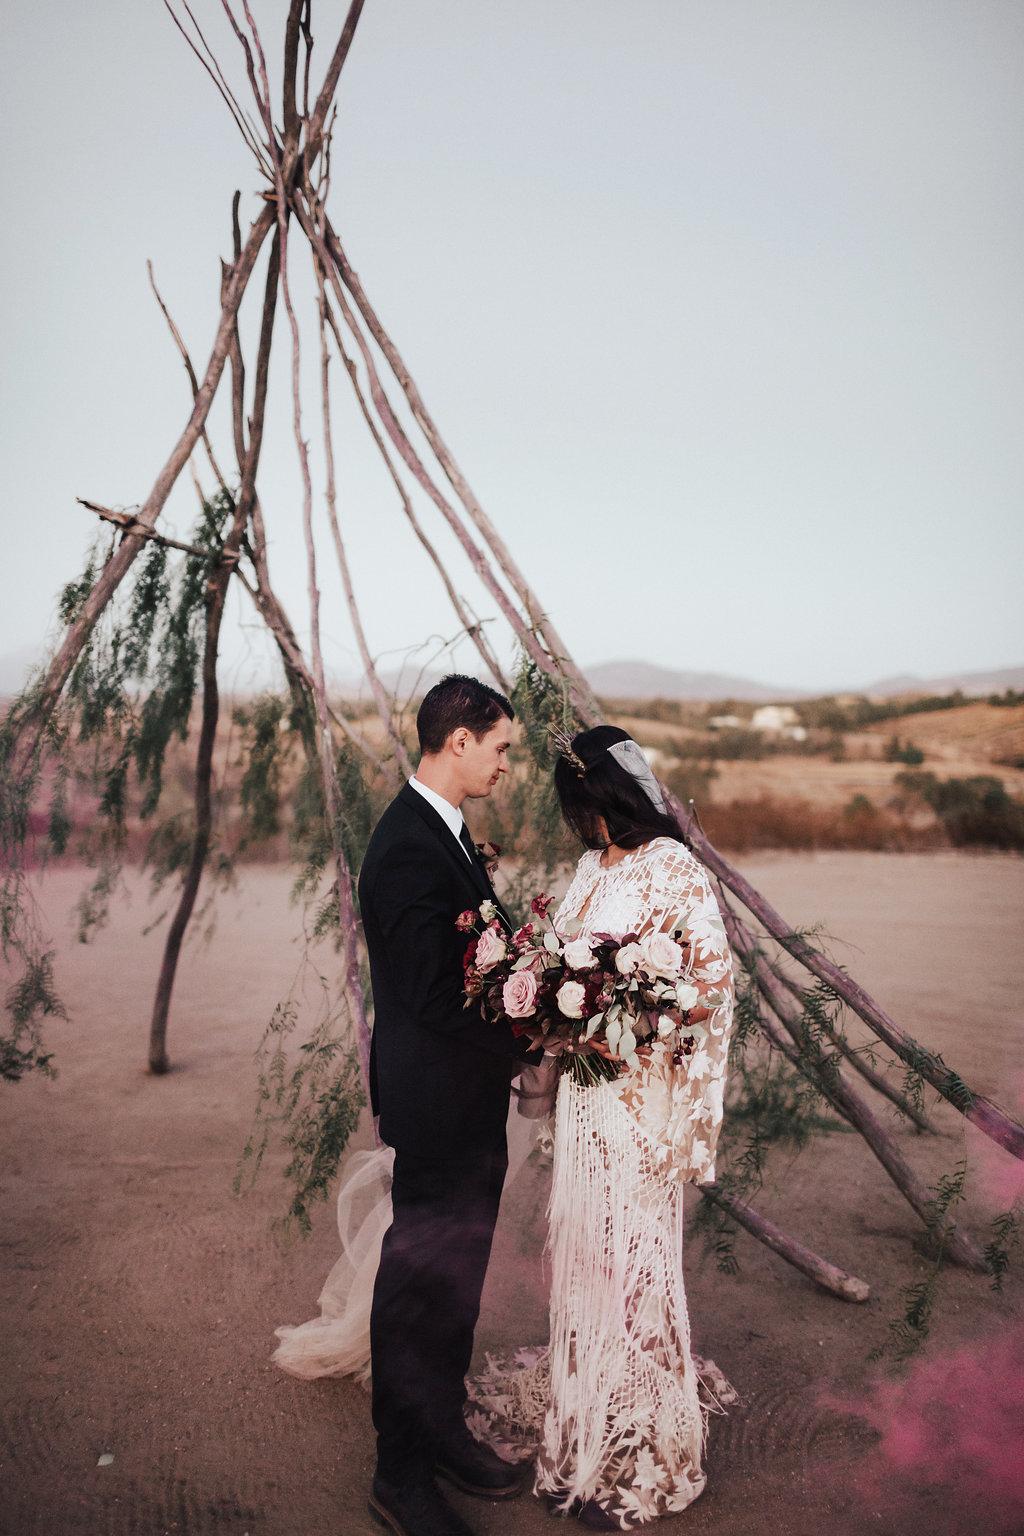 pink-smoke-bomb-wedding-photo.jpg